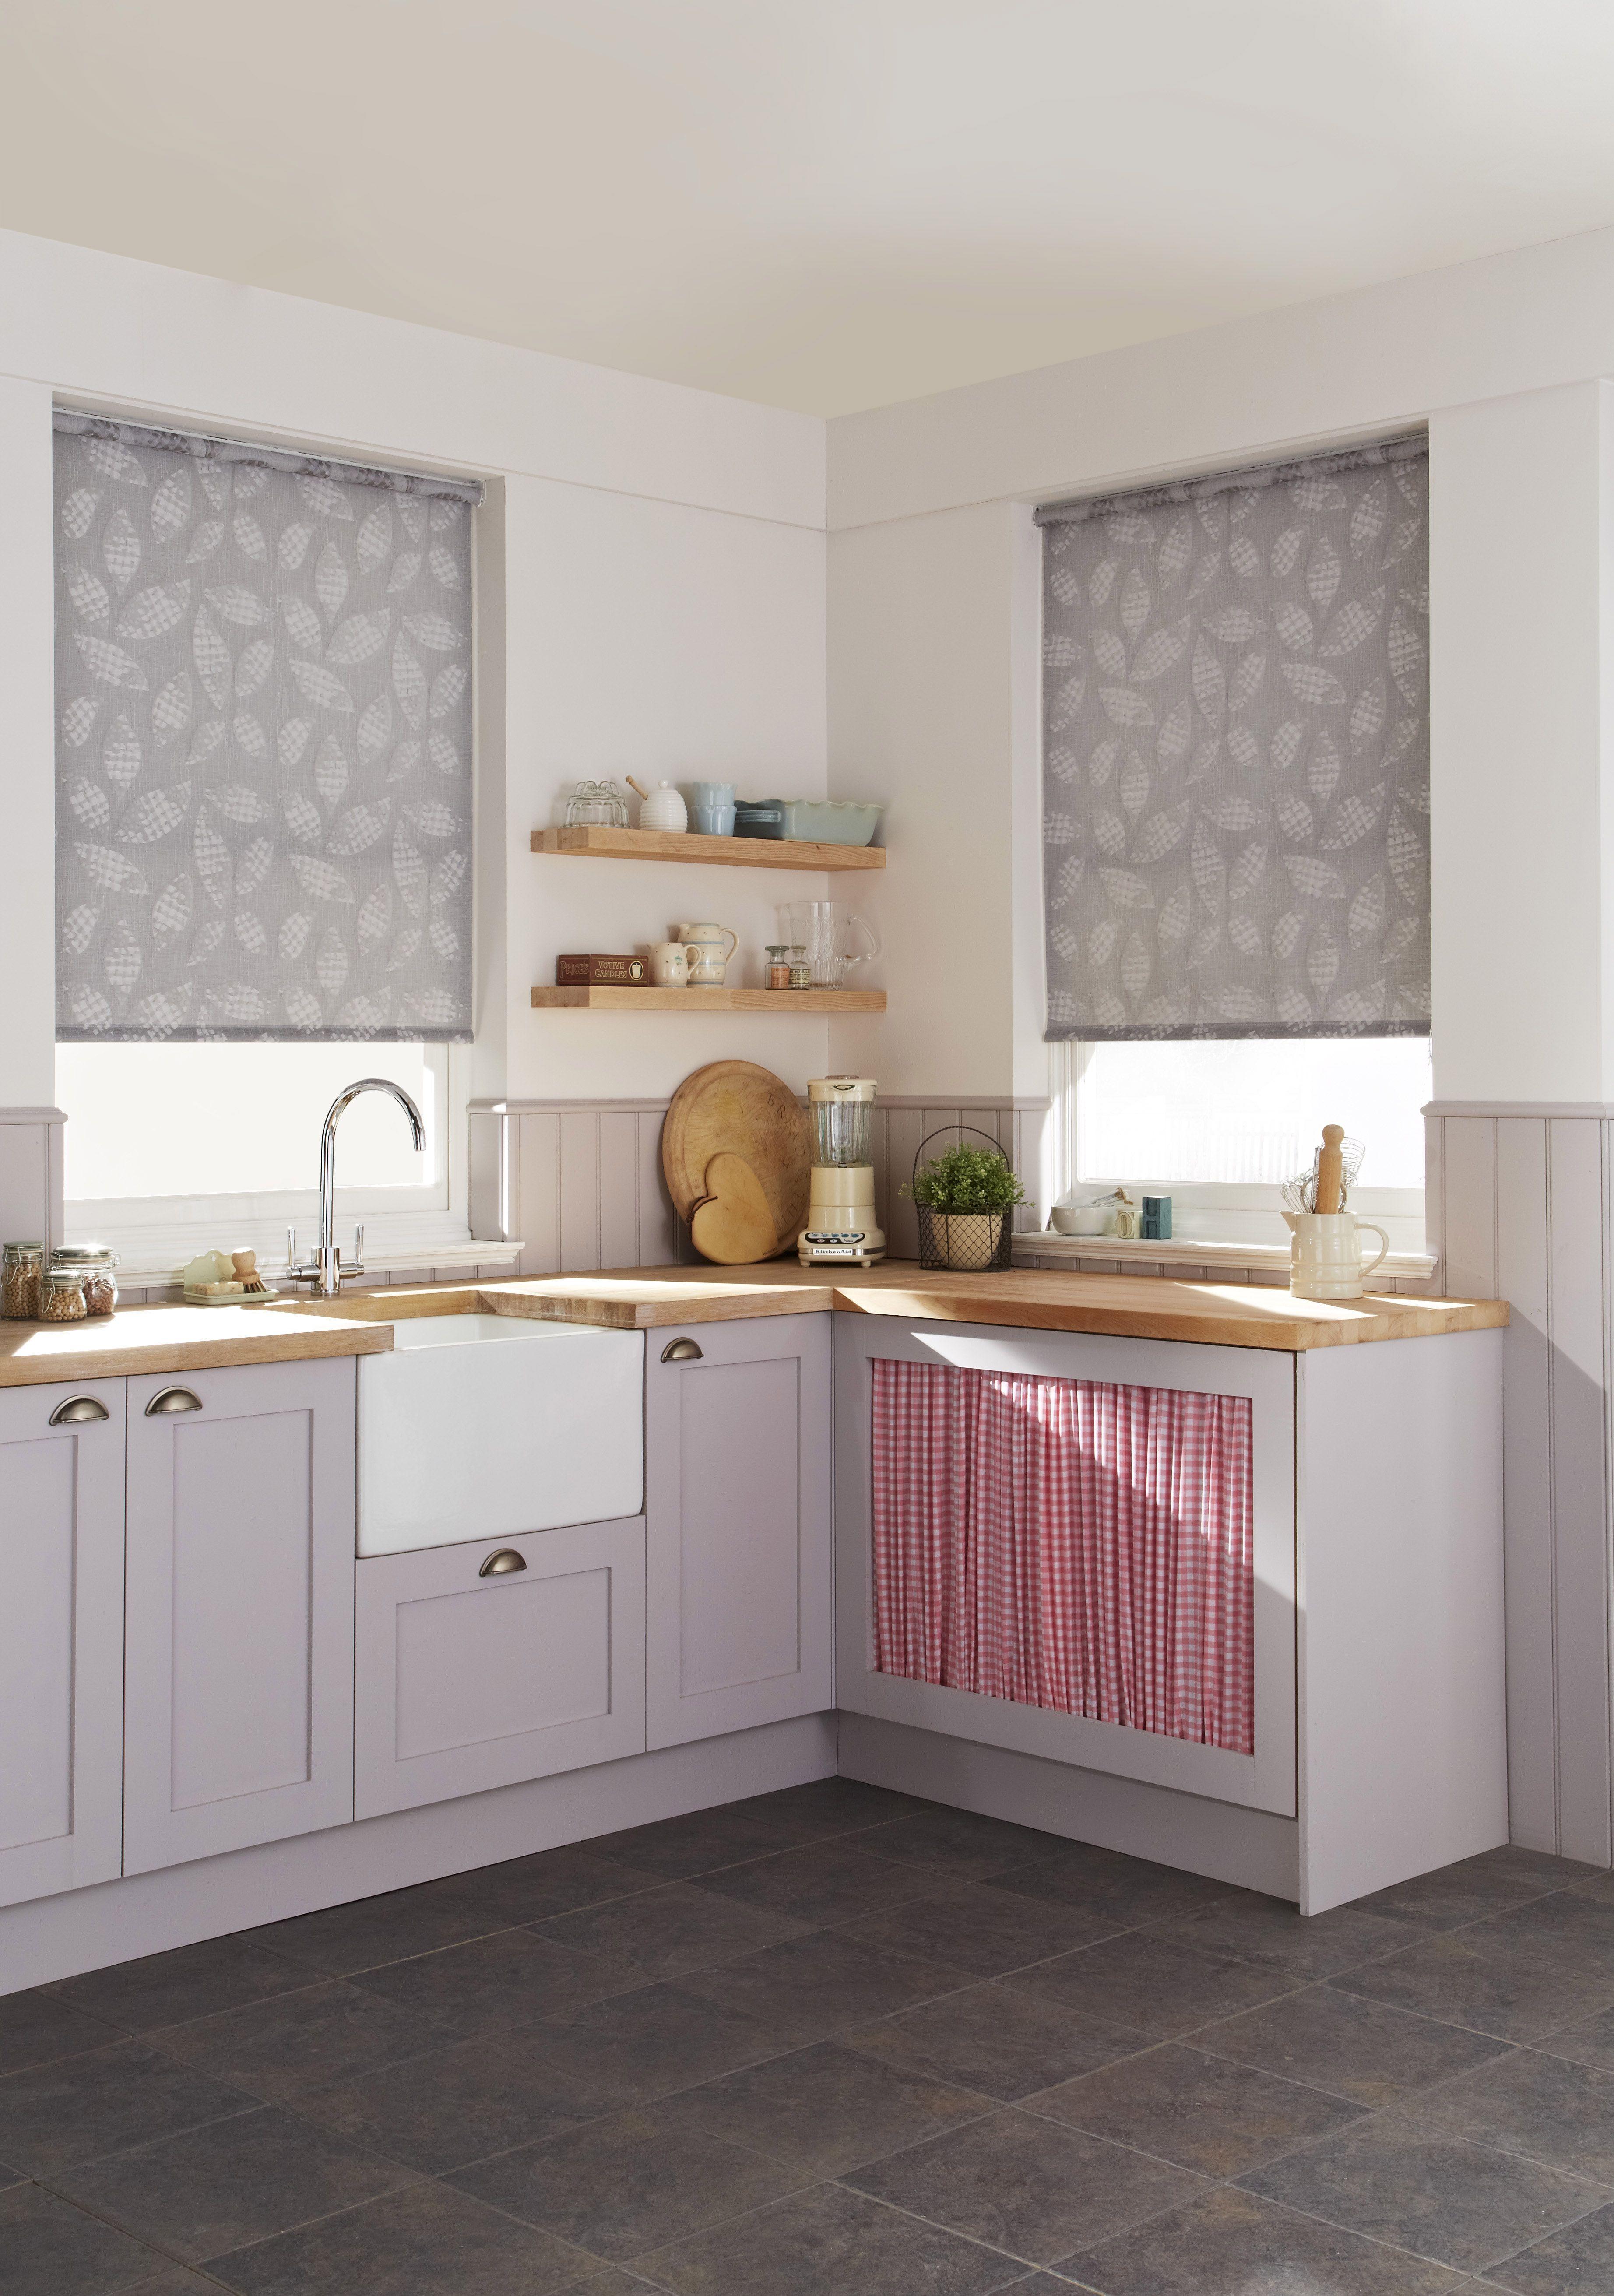 Http://media Cache Ak0.pinimg.com/originals/59/2e/57/592e57437c3e3a390af4da786b65de38  | Kitchen | Pinterest | Grey Roller Blinds, Light Grey Kitchens ...